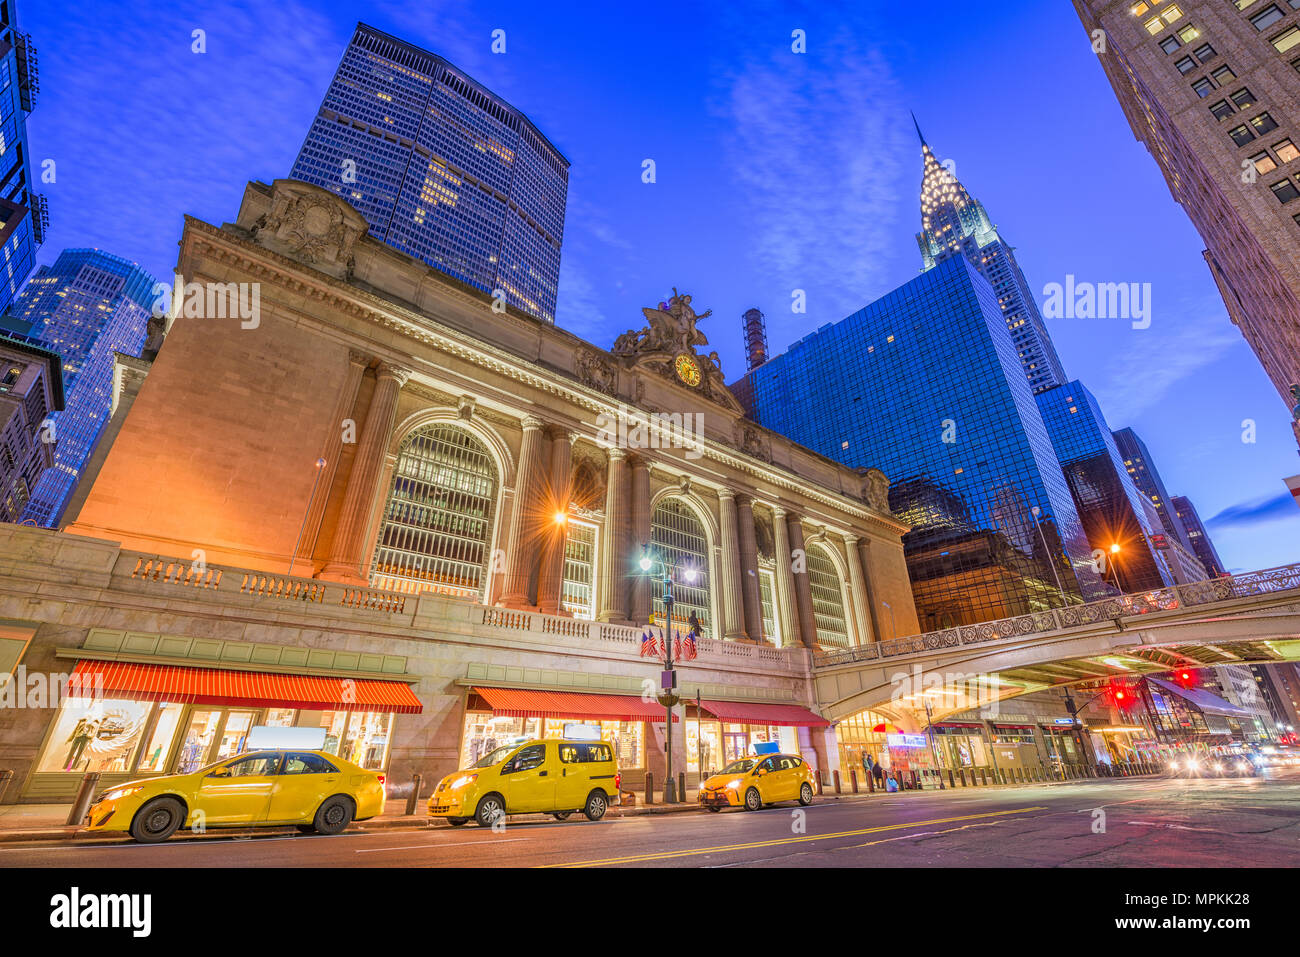 New York, New York, USA am Grand Central Terminal in Midtown Manhattan am Morgen. Stockbild